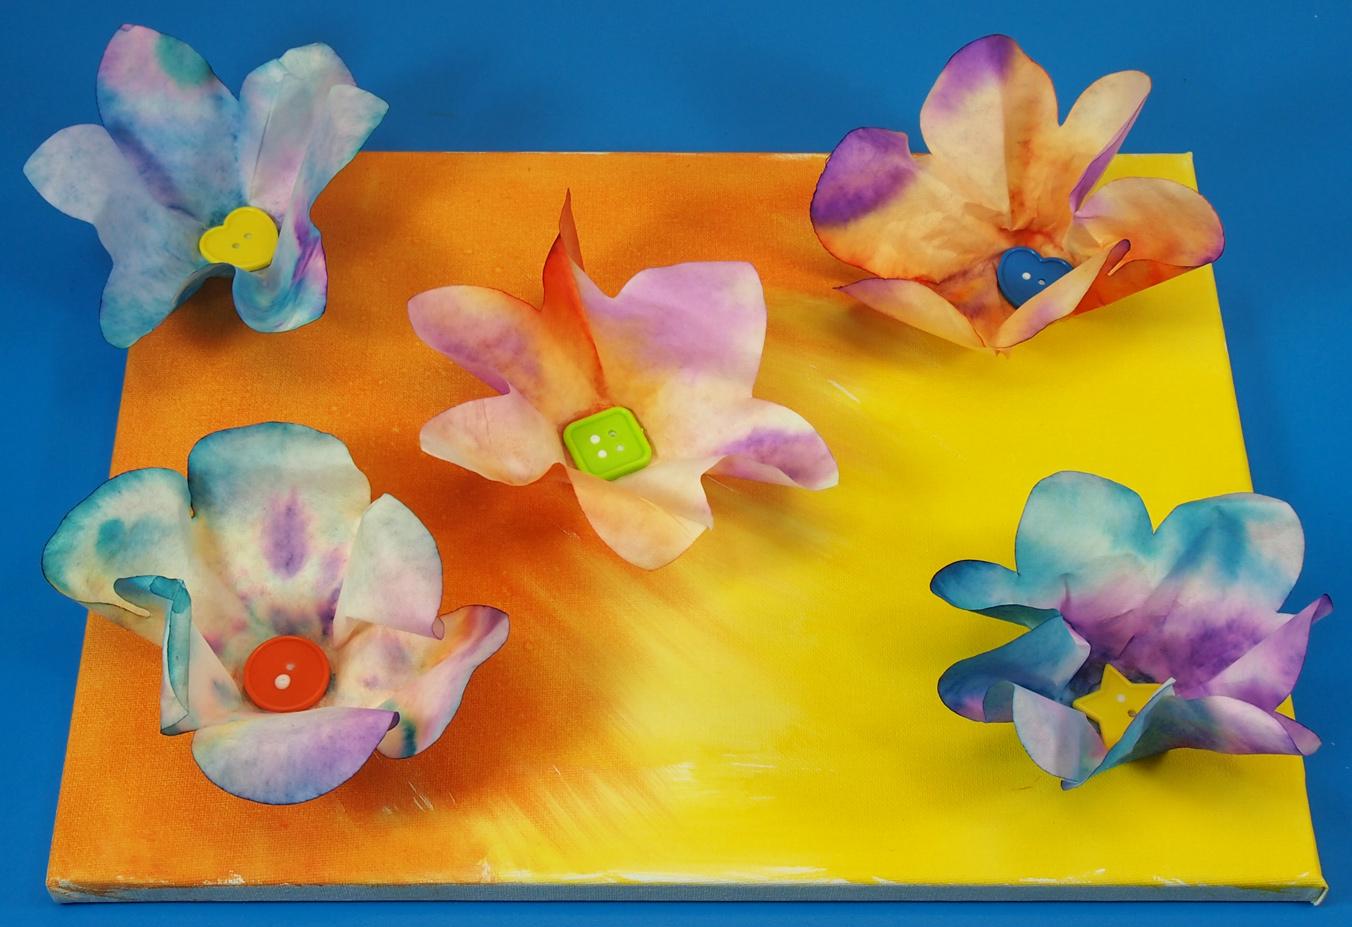 3D Flower Wall Art | Roylco